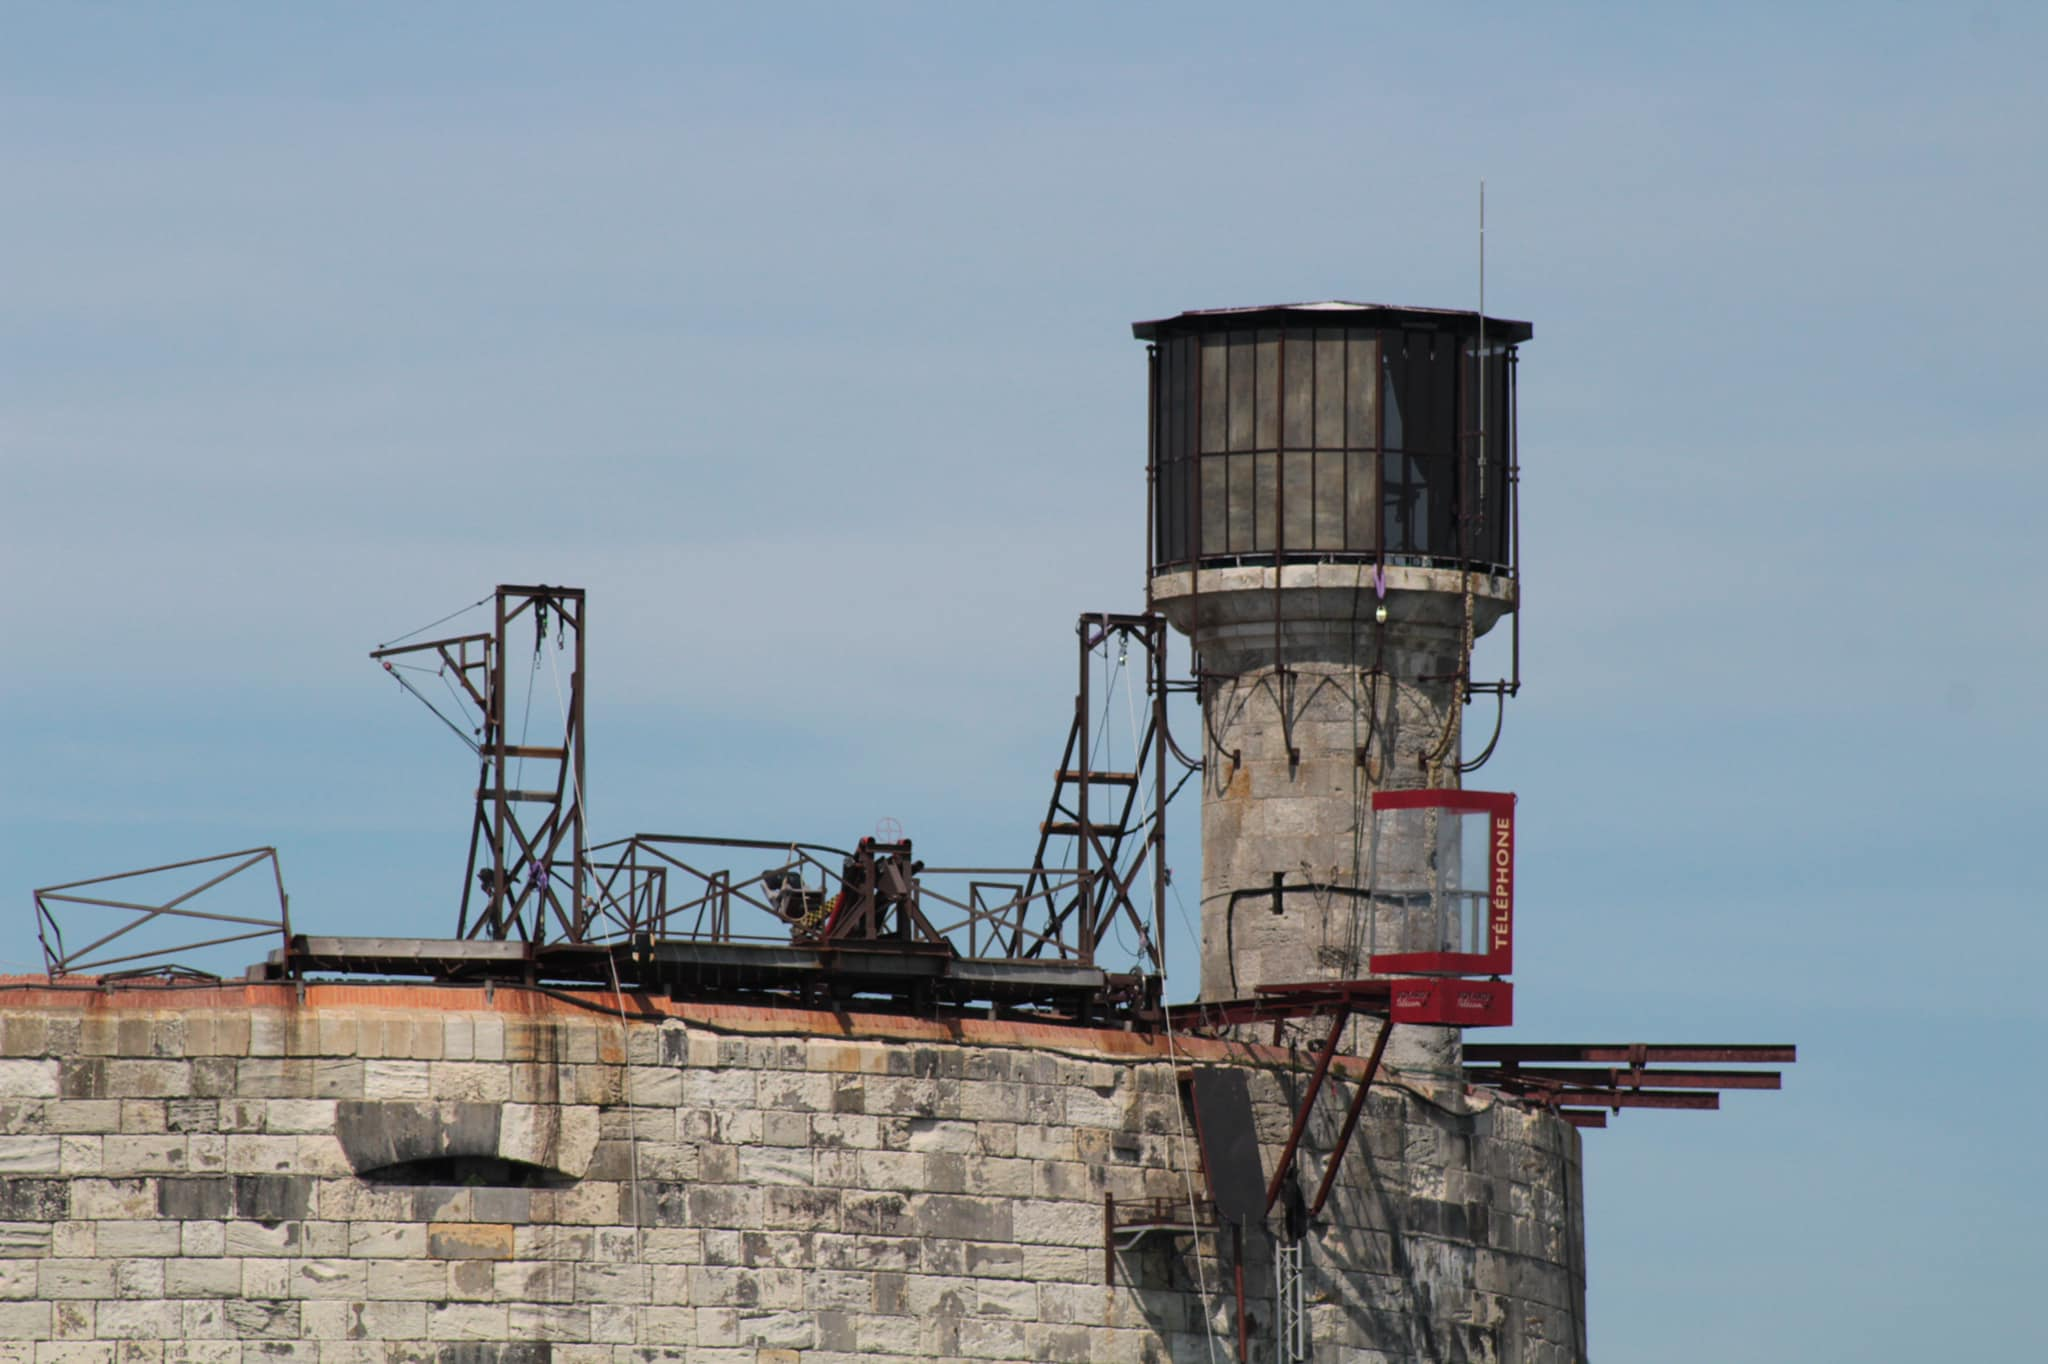 Photos des tournages Fort Boyard 2021 (production + candidats) - Page 6 18334010